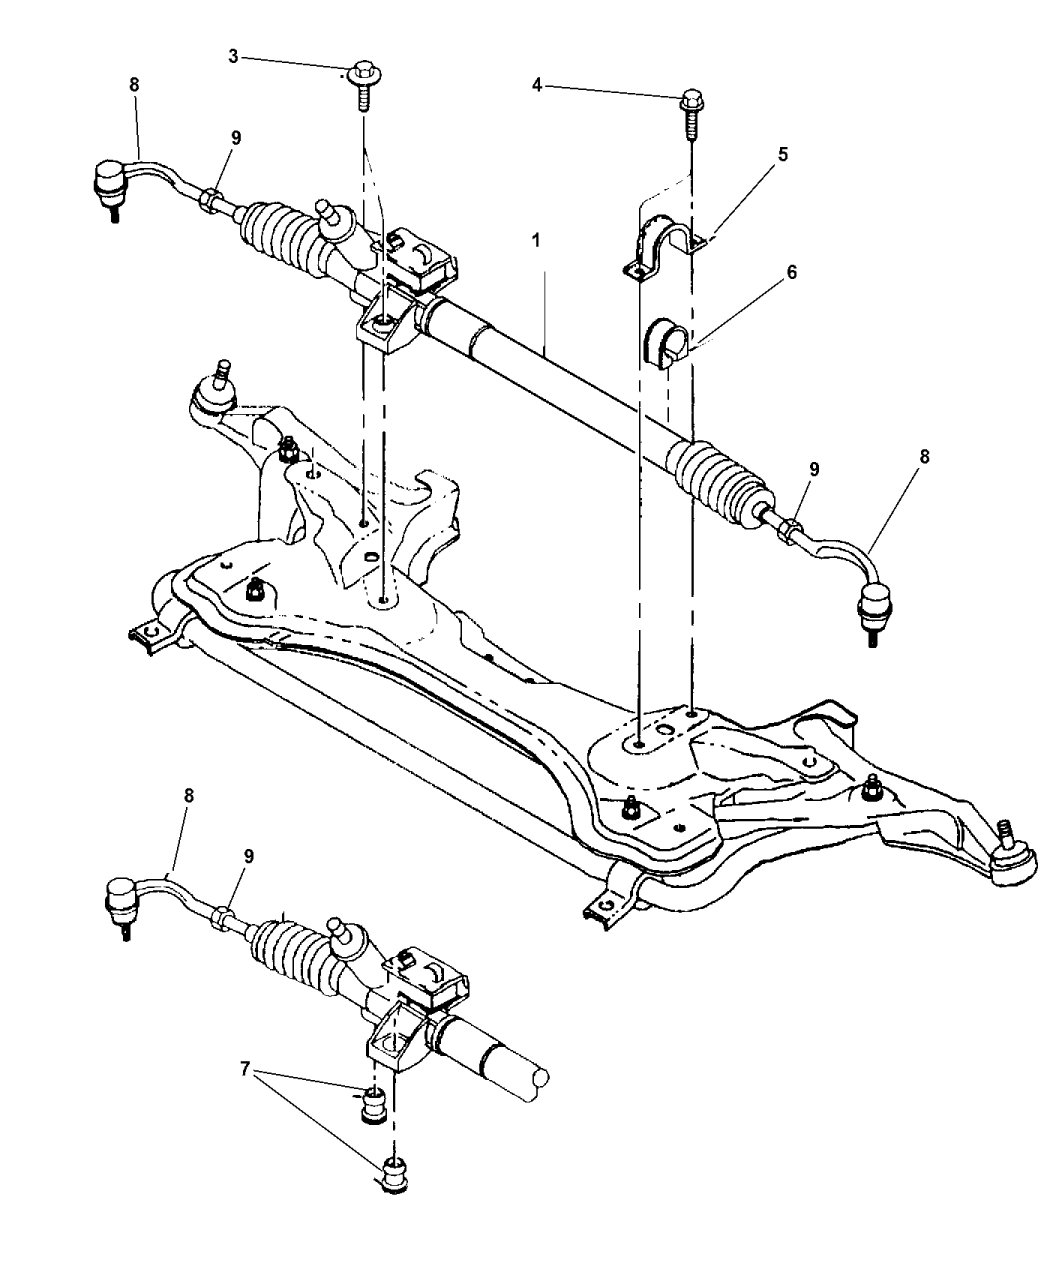 2000 chrysler cirrus gear